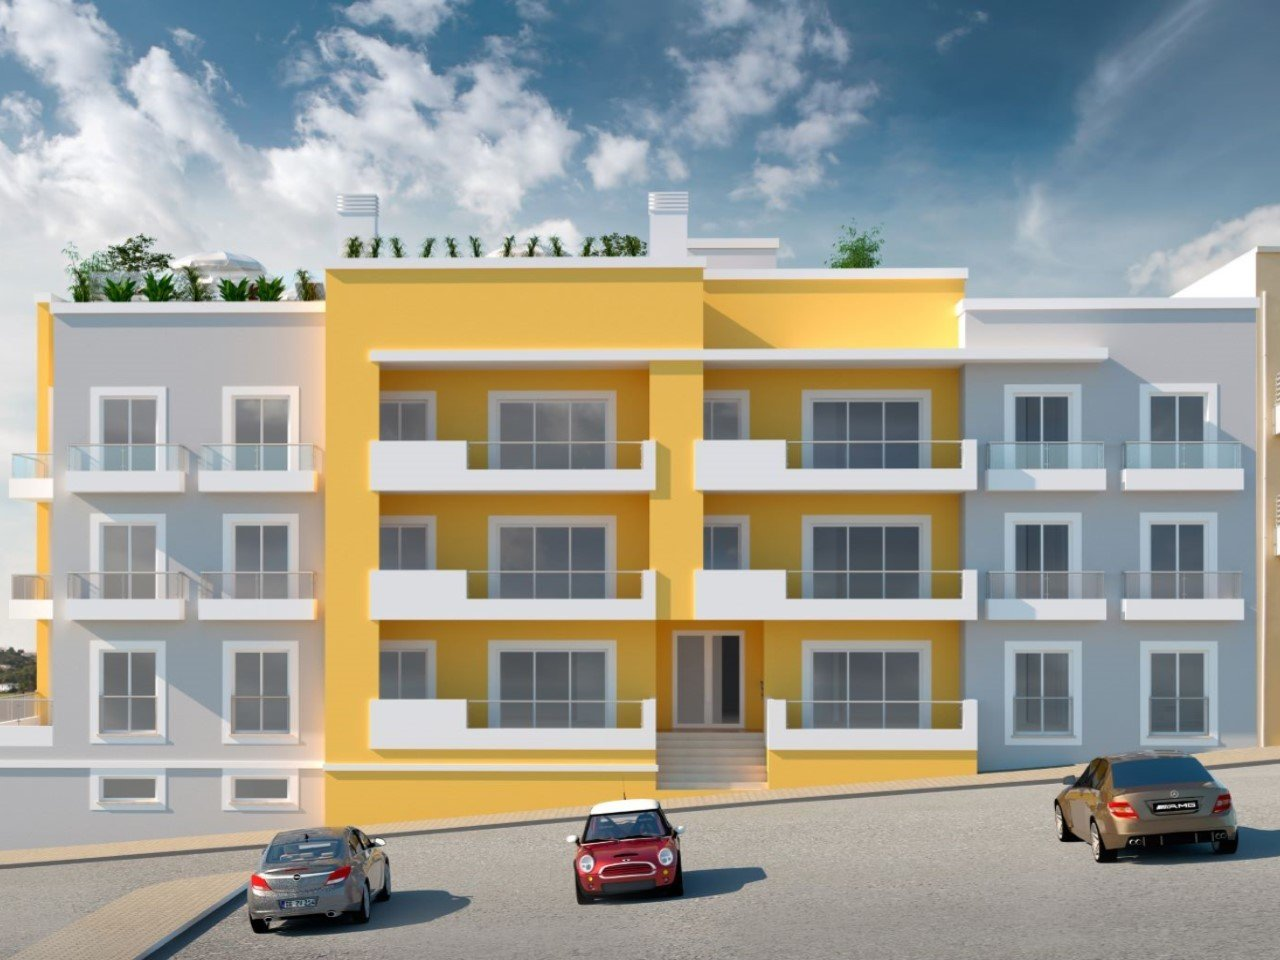 3 Bedroom Apartment Lagos, Western Algarve Ref: GA338D